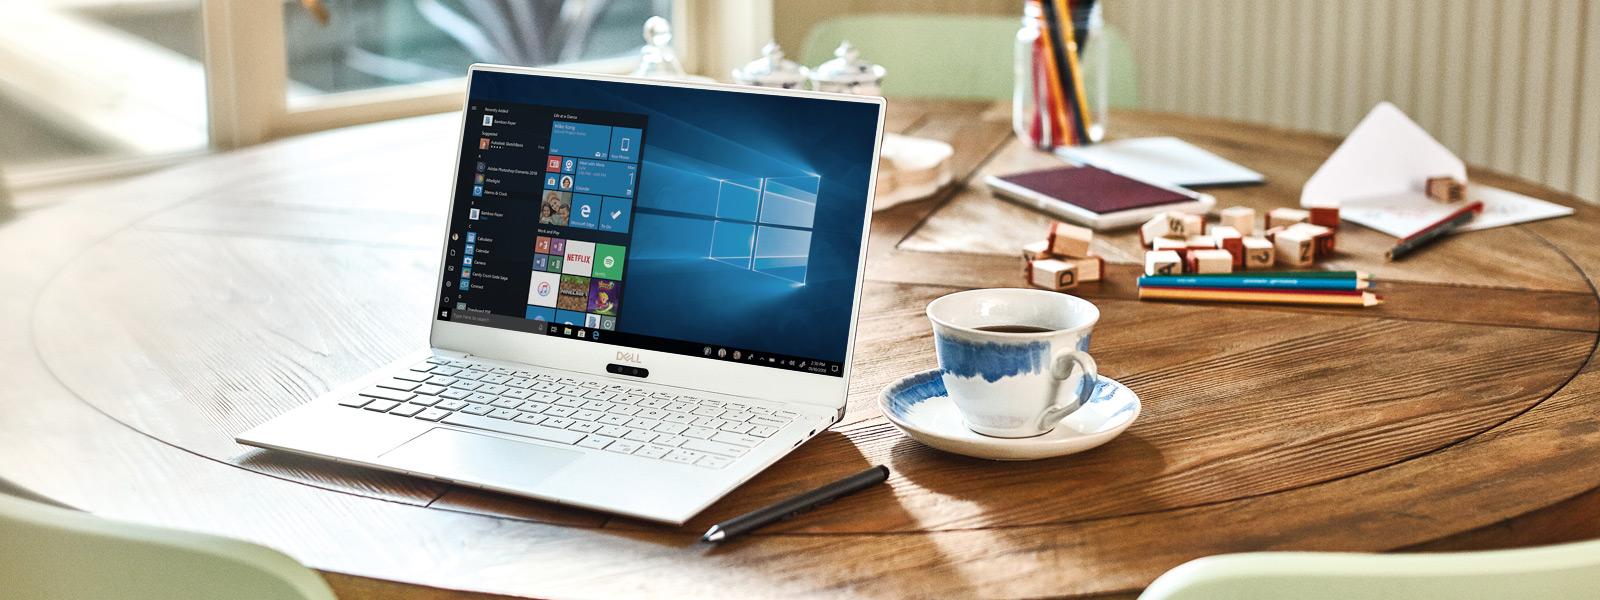 Dell XPS 13 9370 เปิดอยู่บนโต๊ะ โดยมีหน้าจอเริ่มต้นของ Windows 10